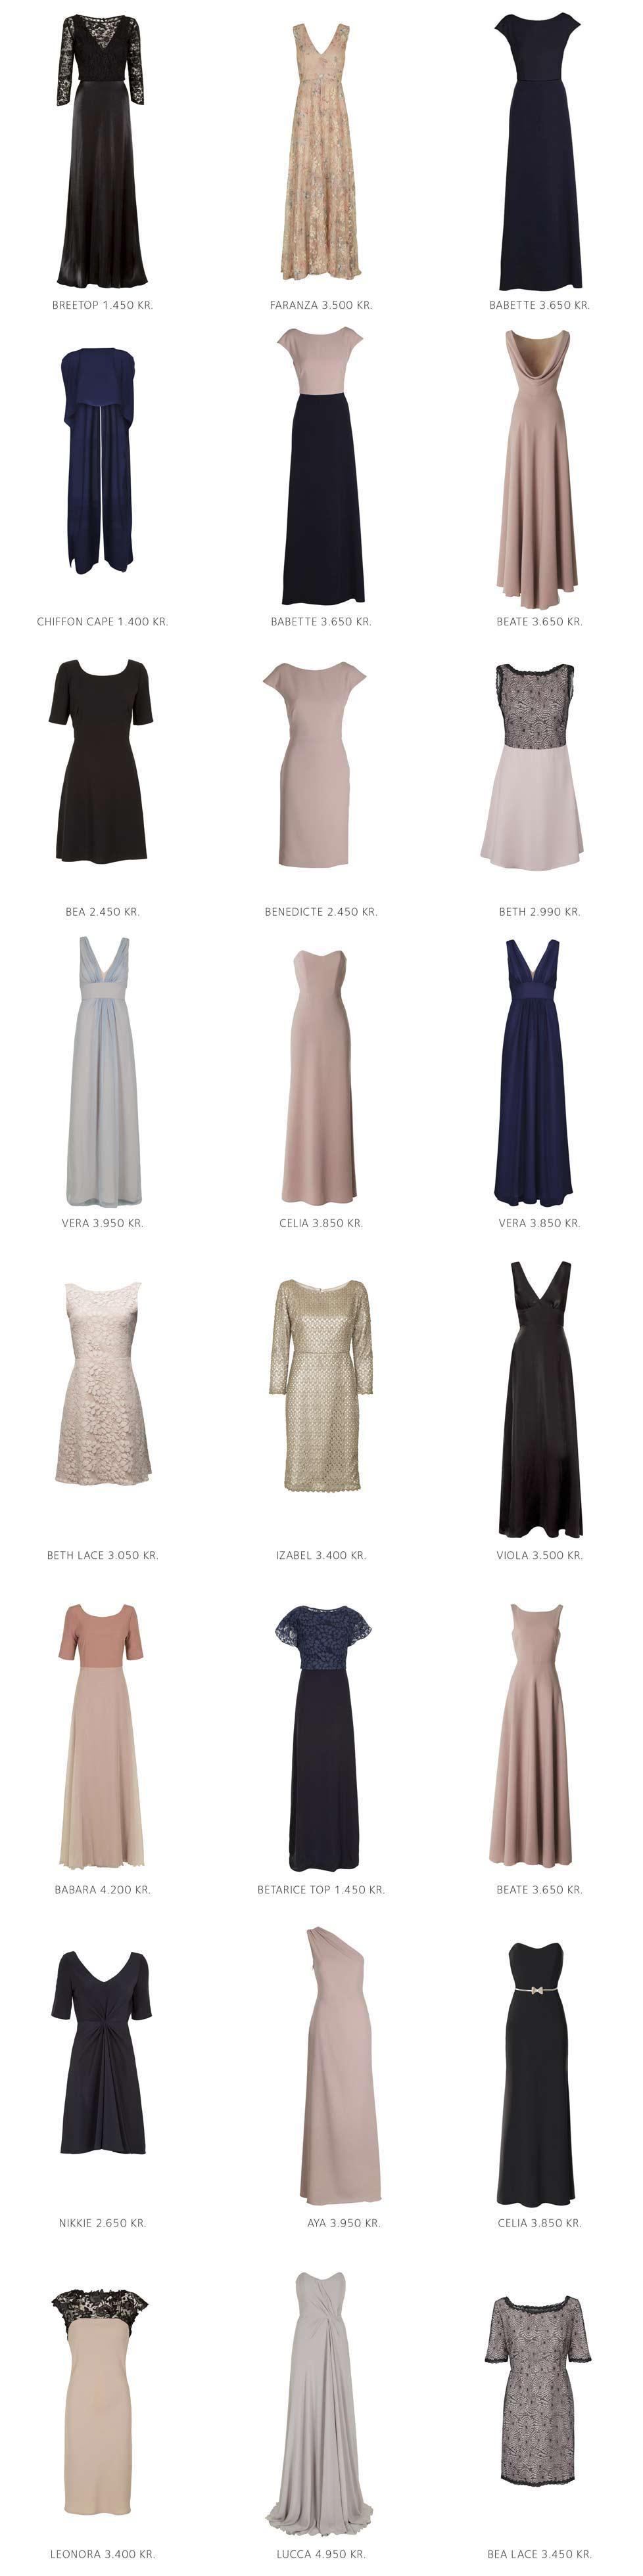 Dress Maxi Lou Kjoler Dresses 2019 Love Pinterest Galleri 2 In xXxTqI